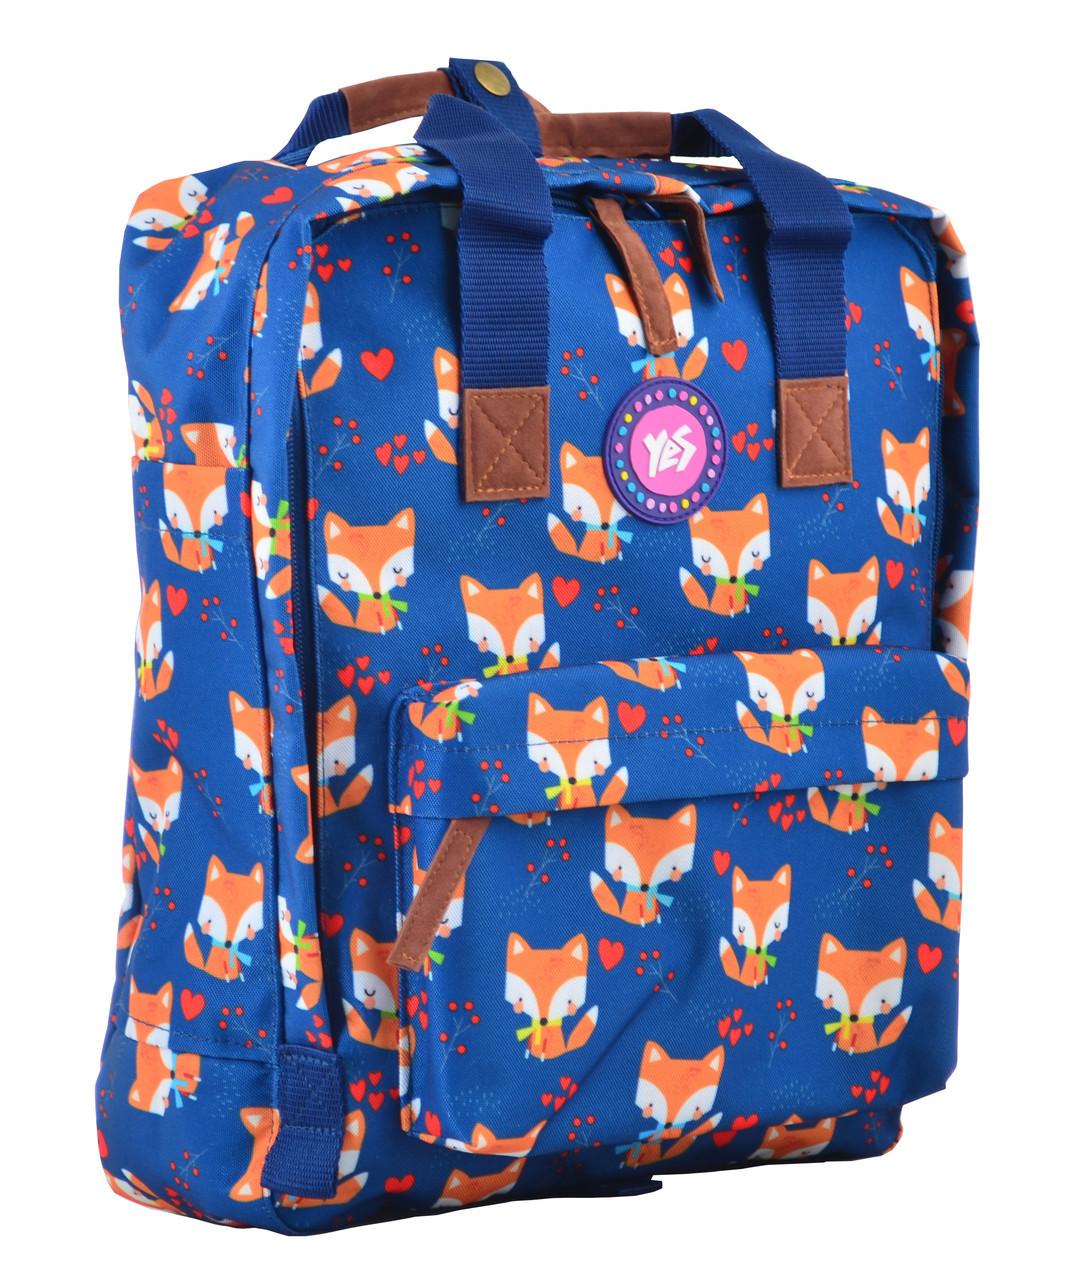 Сумка молодіжна Sly Fox, 35.5*27*10.5